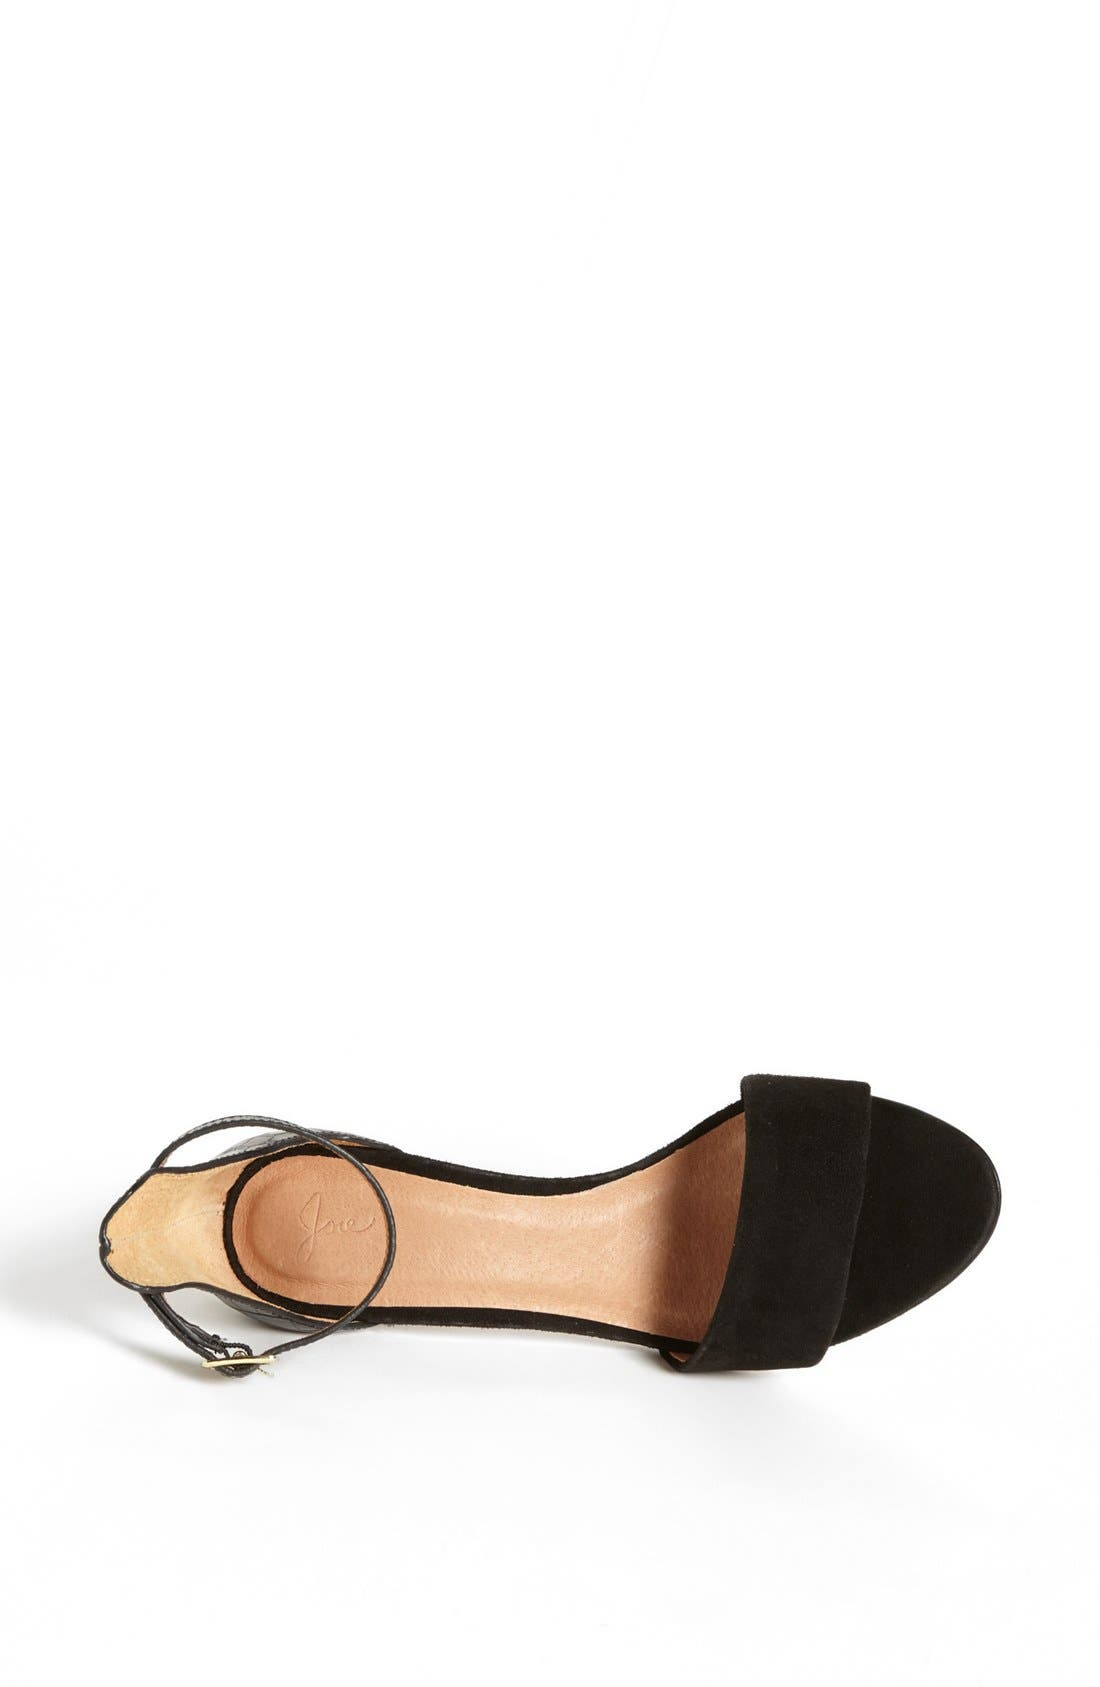 Alternate Image 3  - Joie 'Jaclyn' Leather Sandal